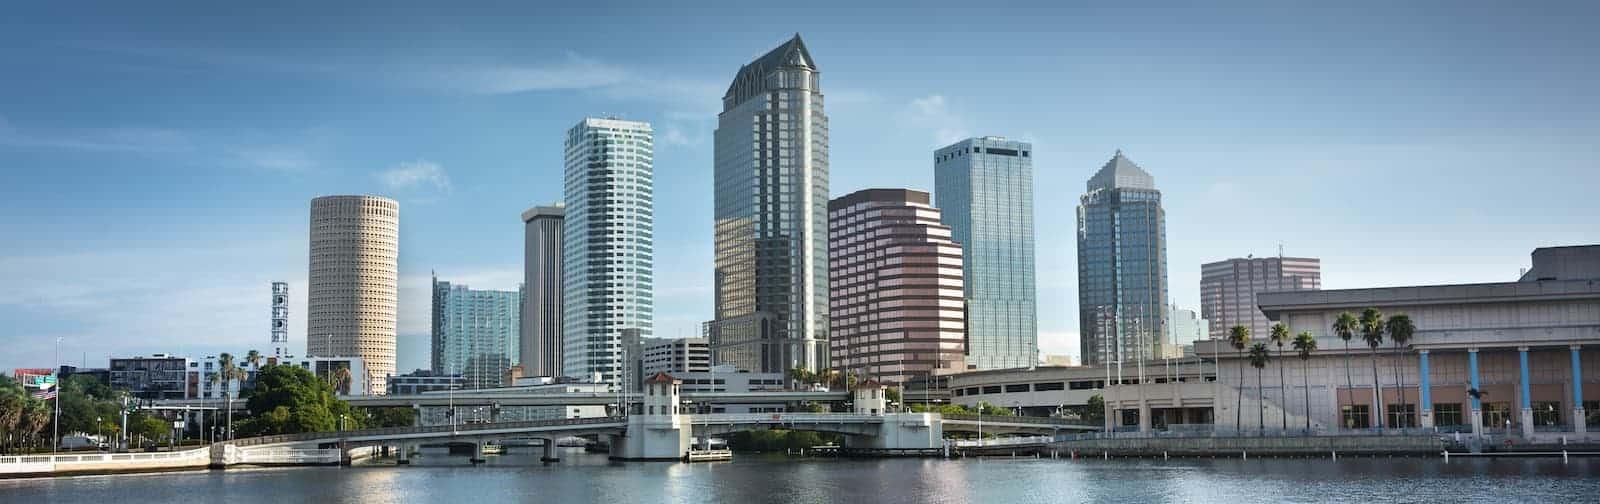 Tampa Skyline with Hillsborough Bay & Riverwalk